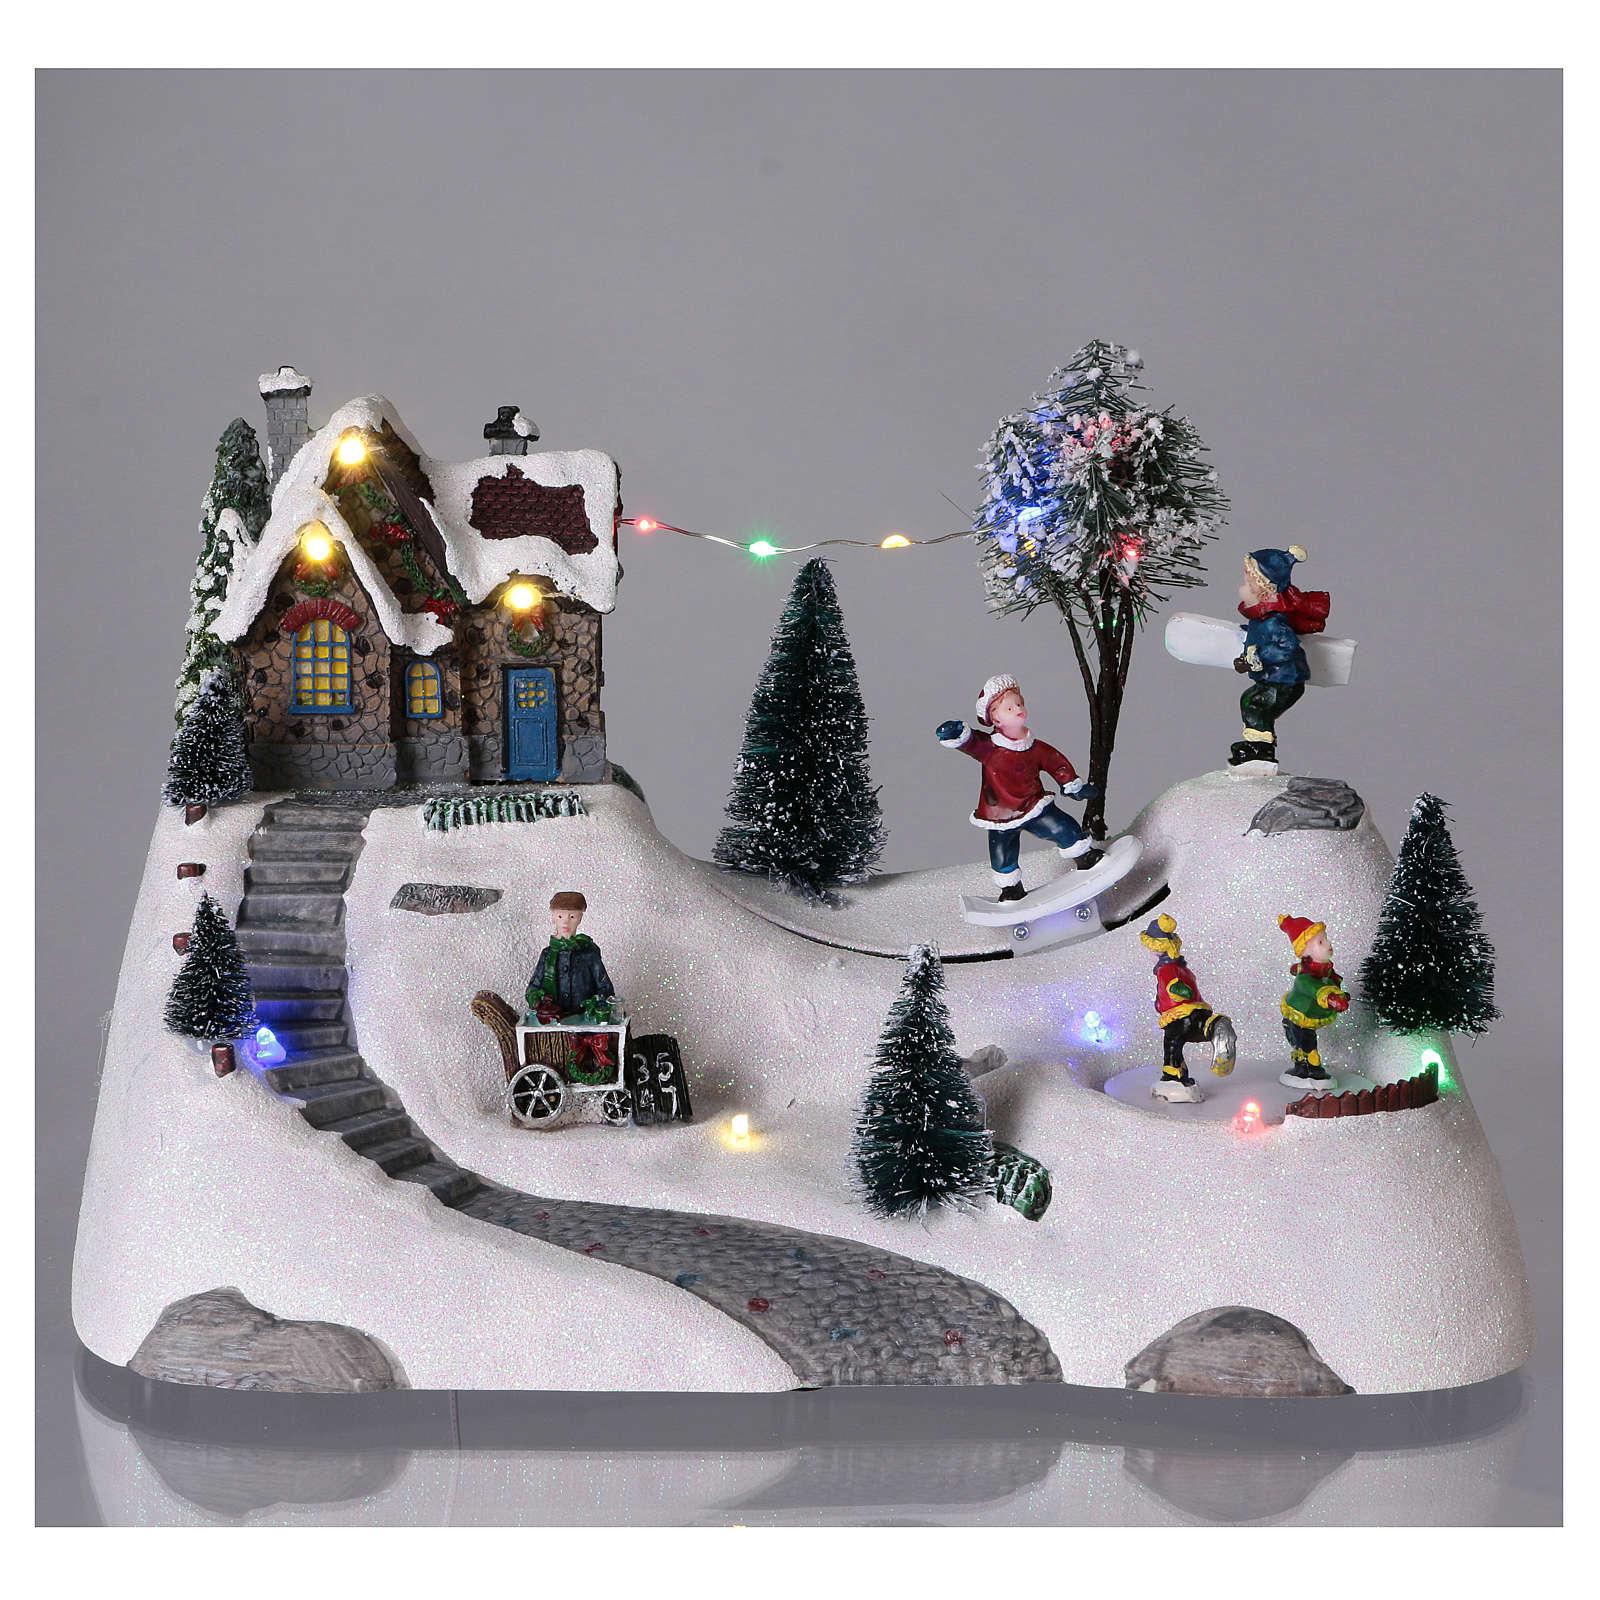 Christmas Ice Skating Rink Decoration.Moving Christmas Scene With Music And Ice Skating Rink 20x30x15 Cm